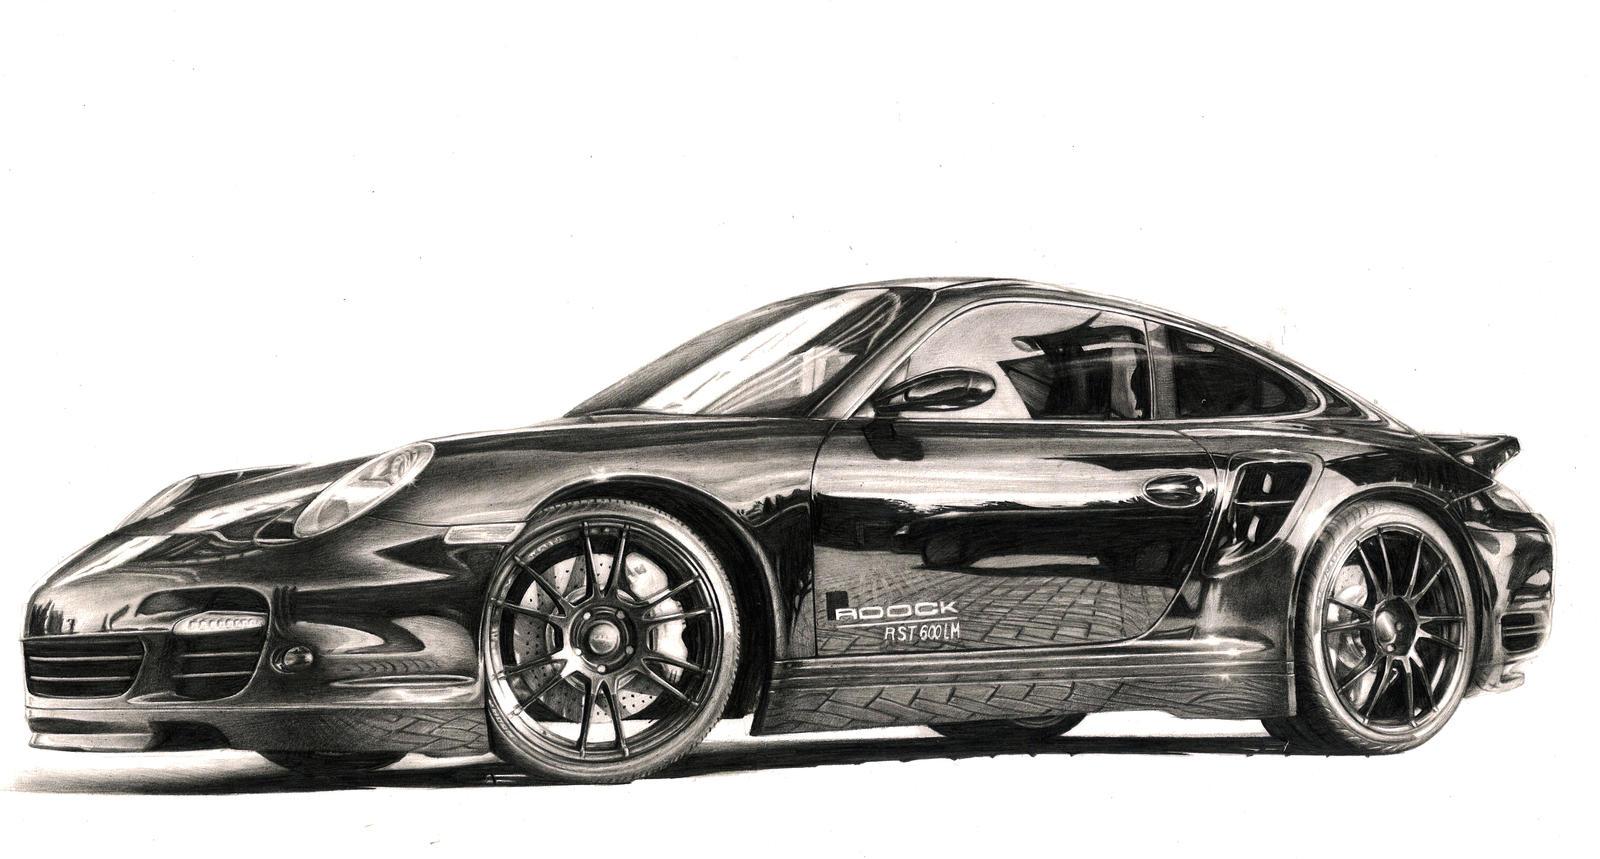 Roock Porsche 911 Turbo R By Dron4ik On DeviantArt